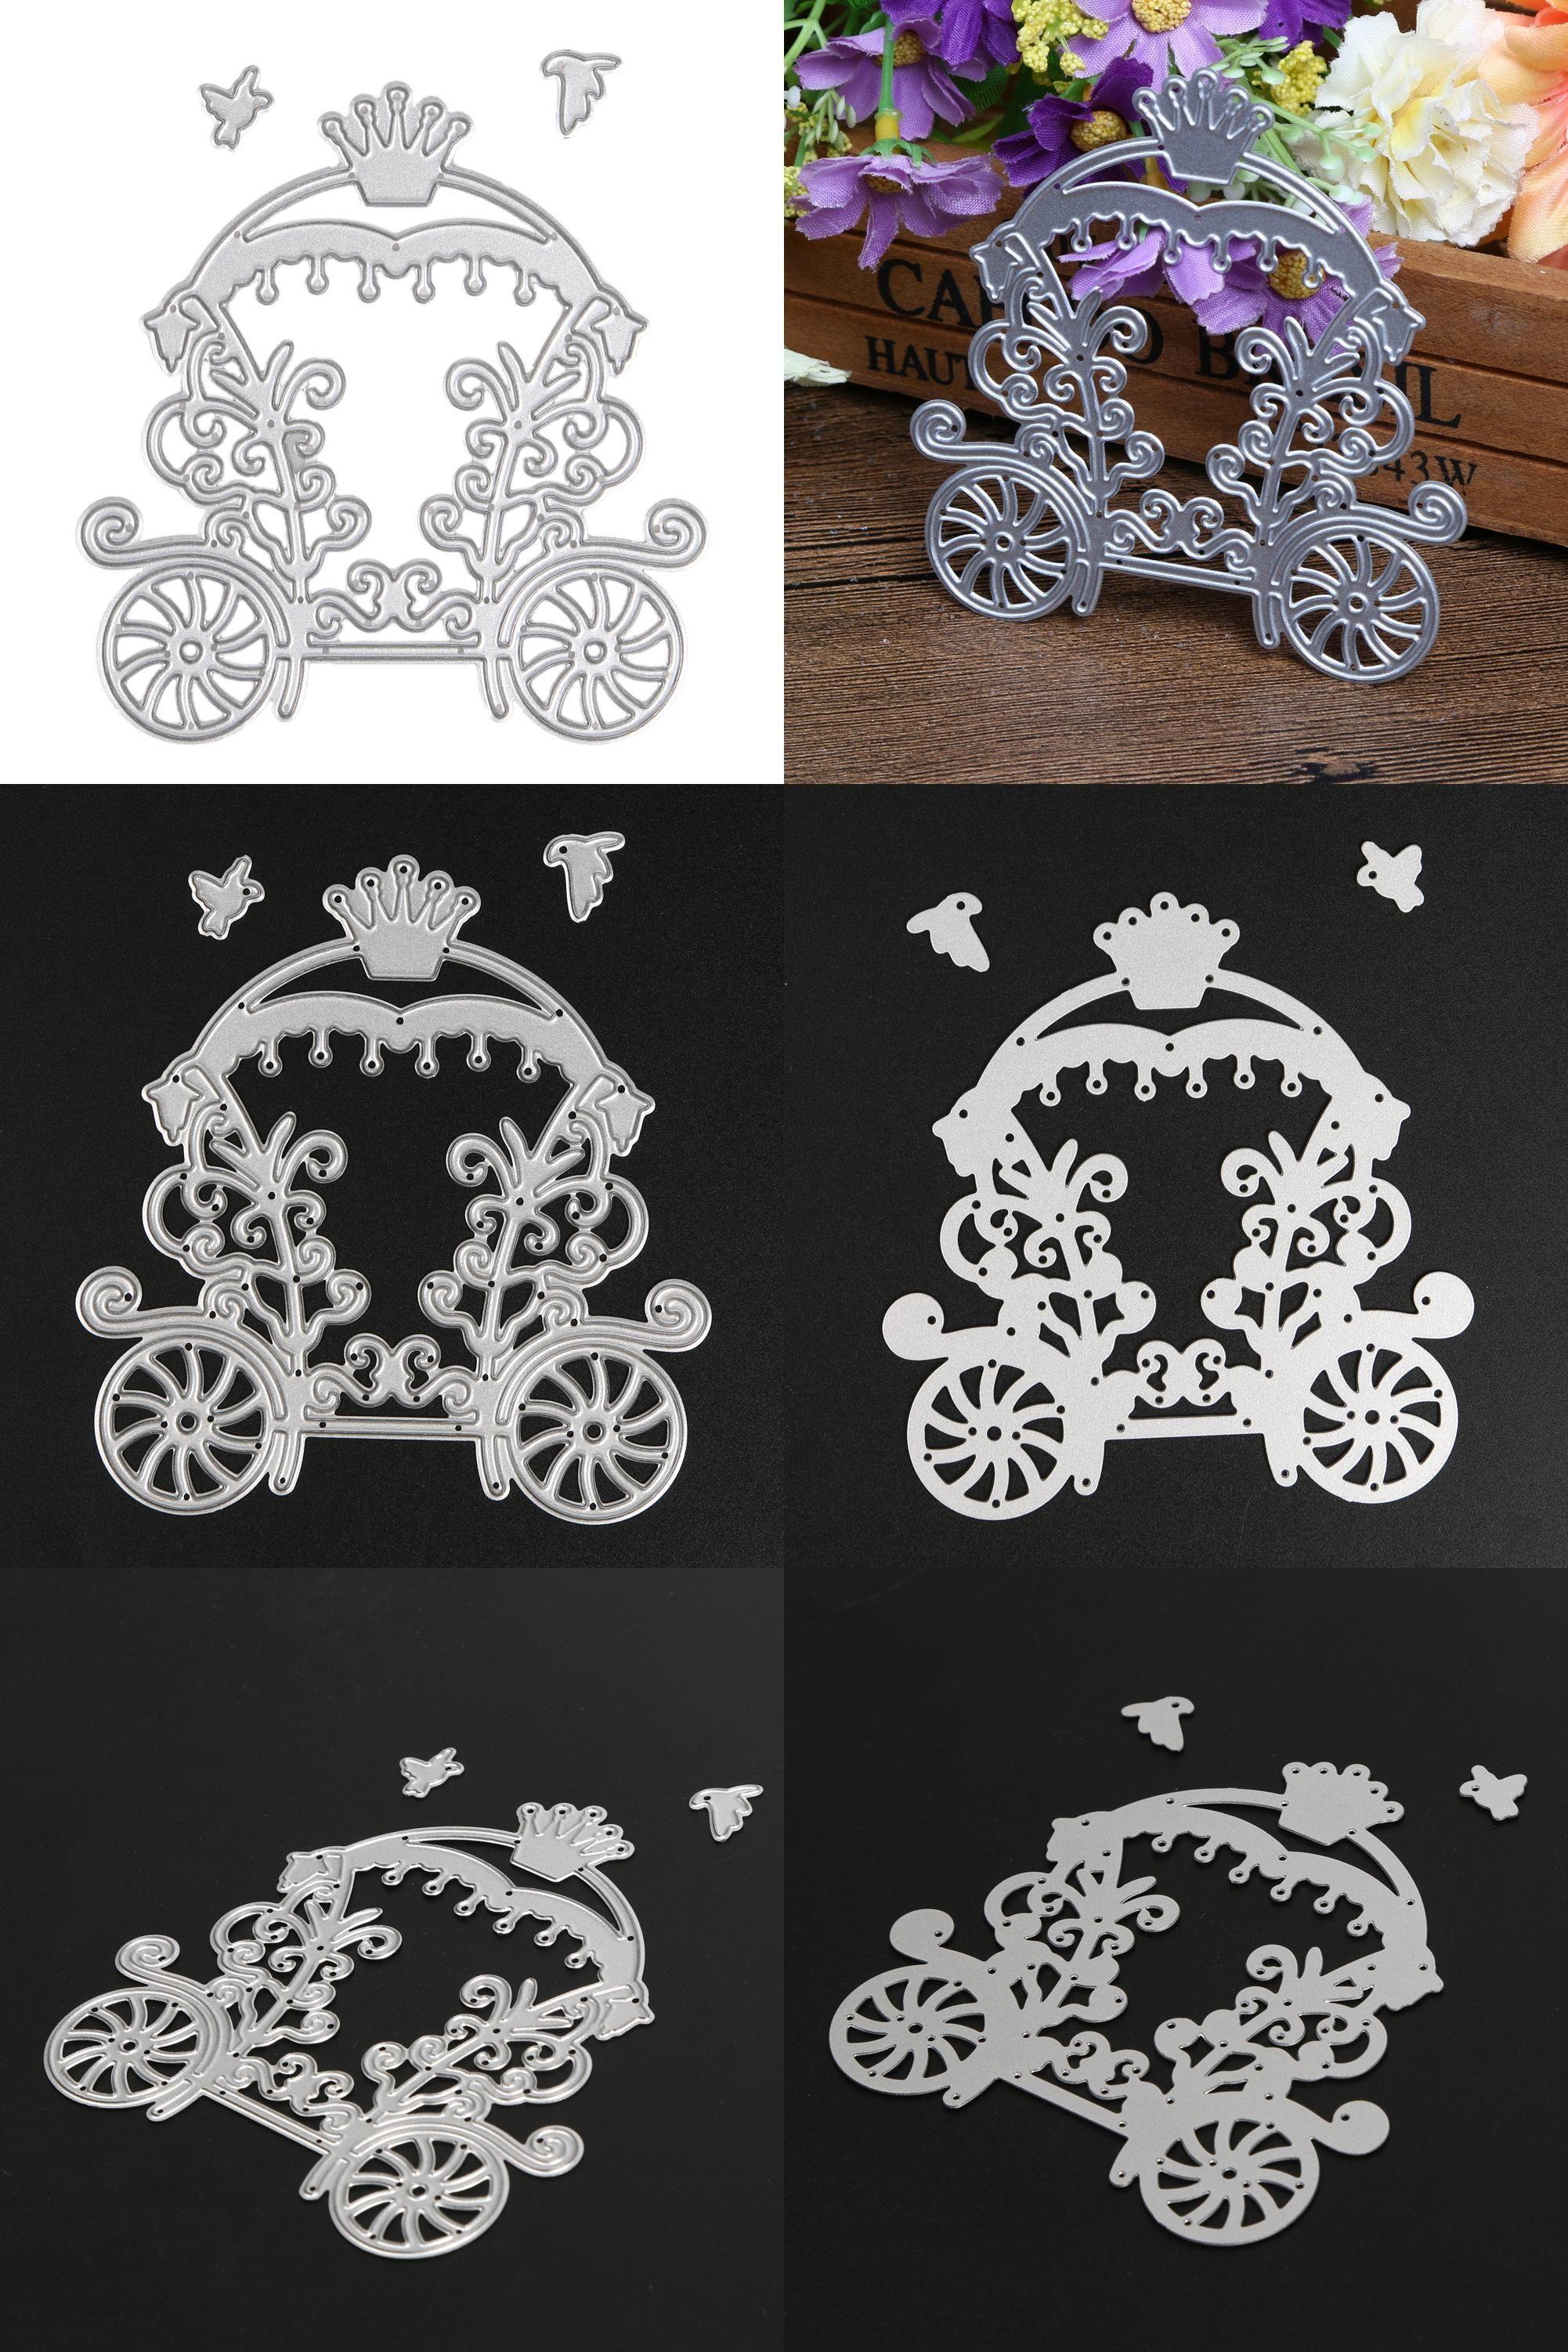 Vintage Metal Cutting Dies Stencils for DIY Embossing Paper Craft Decoration